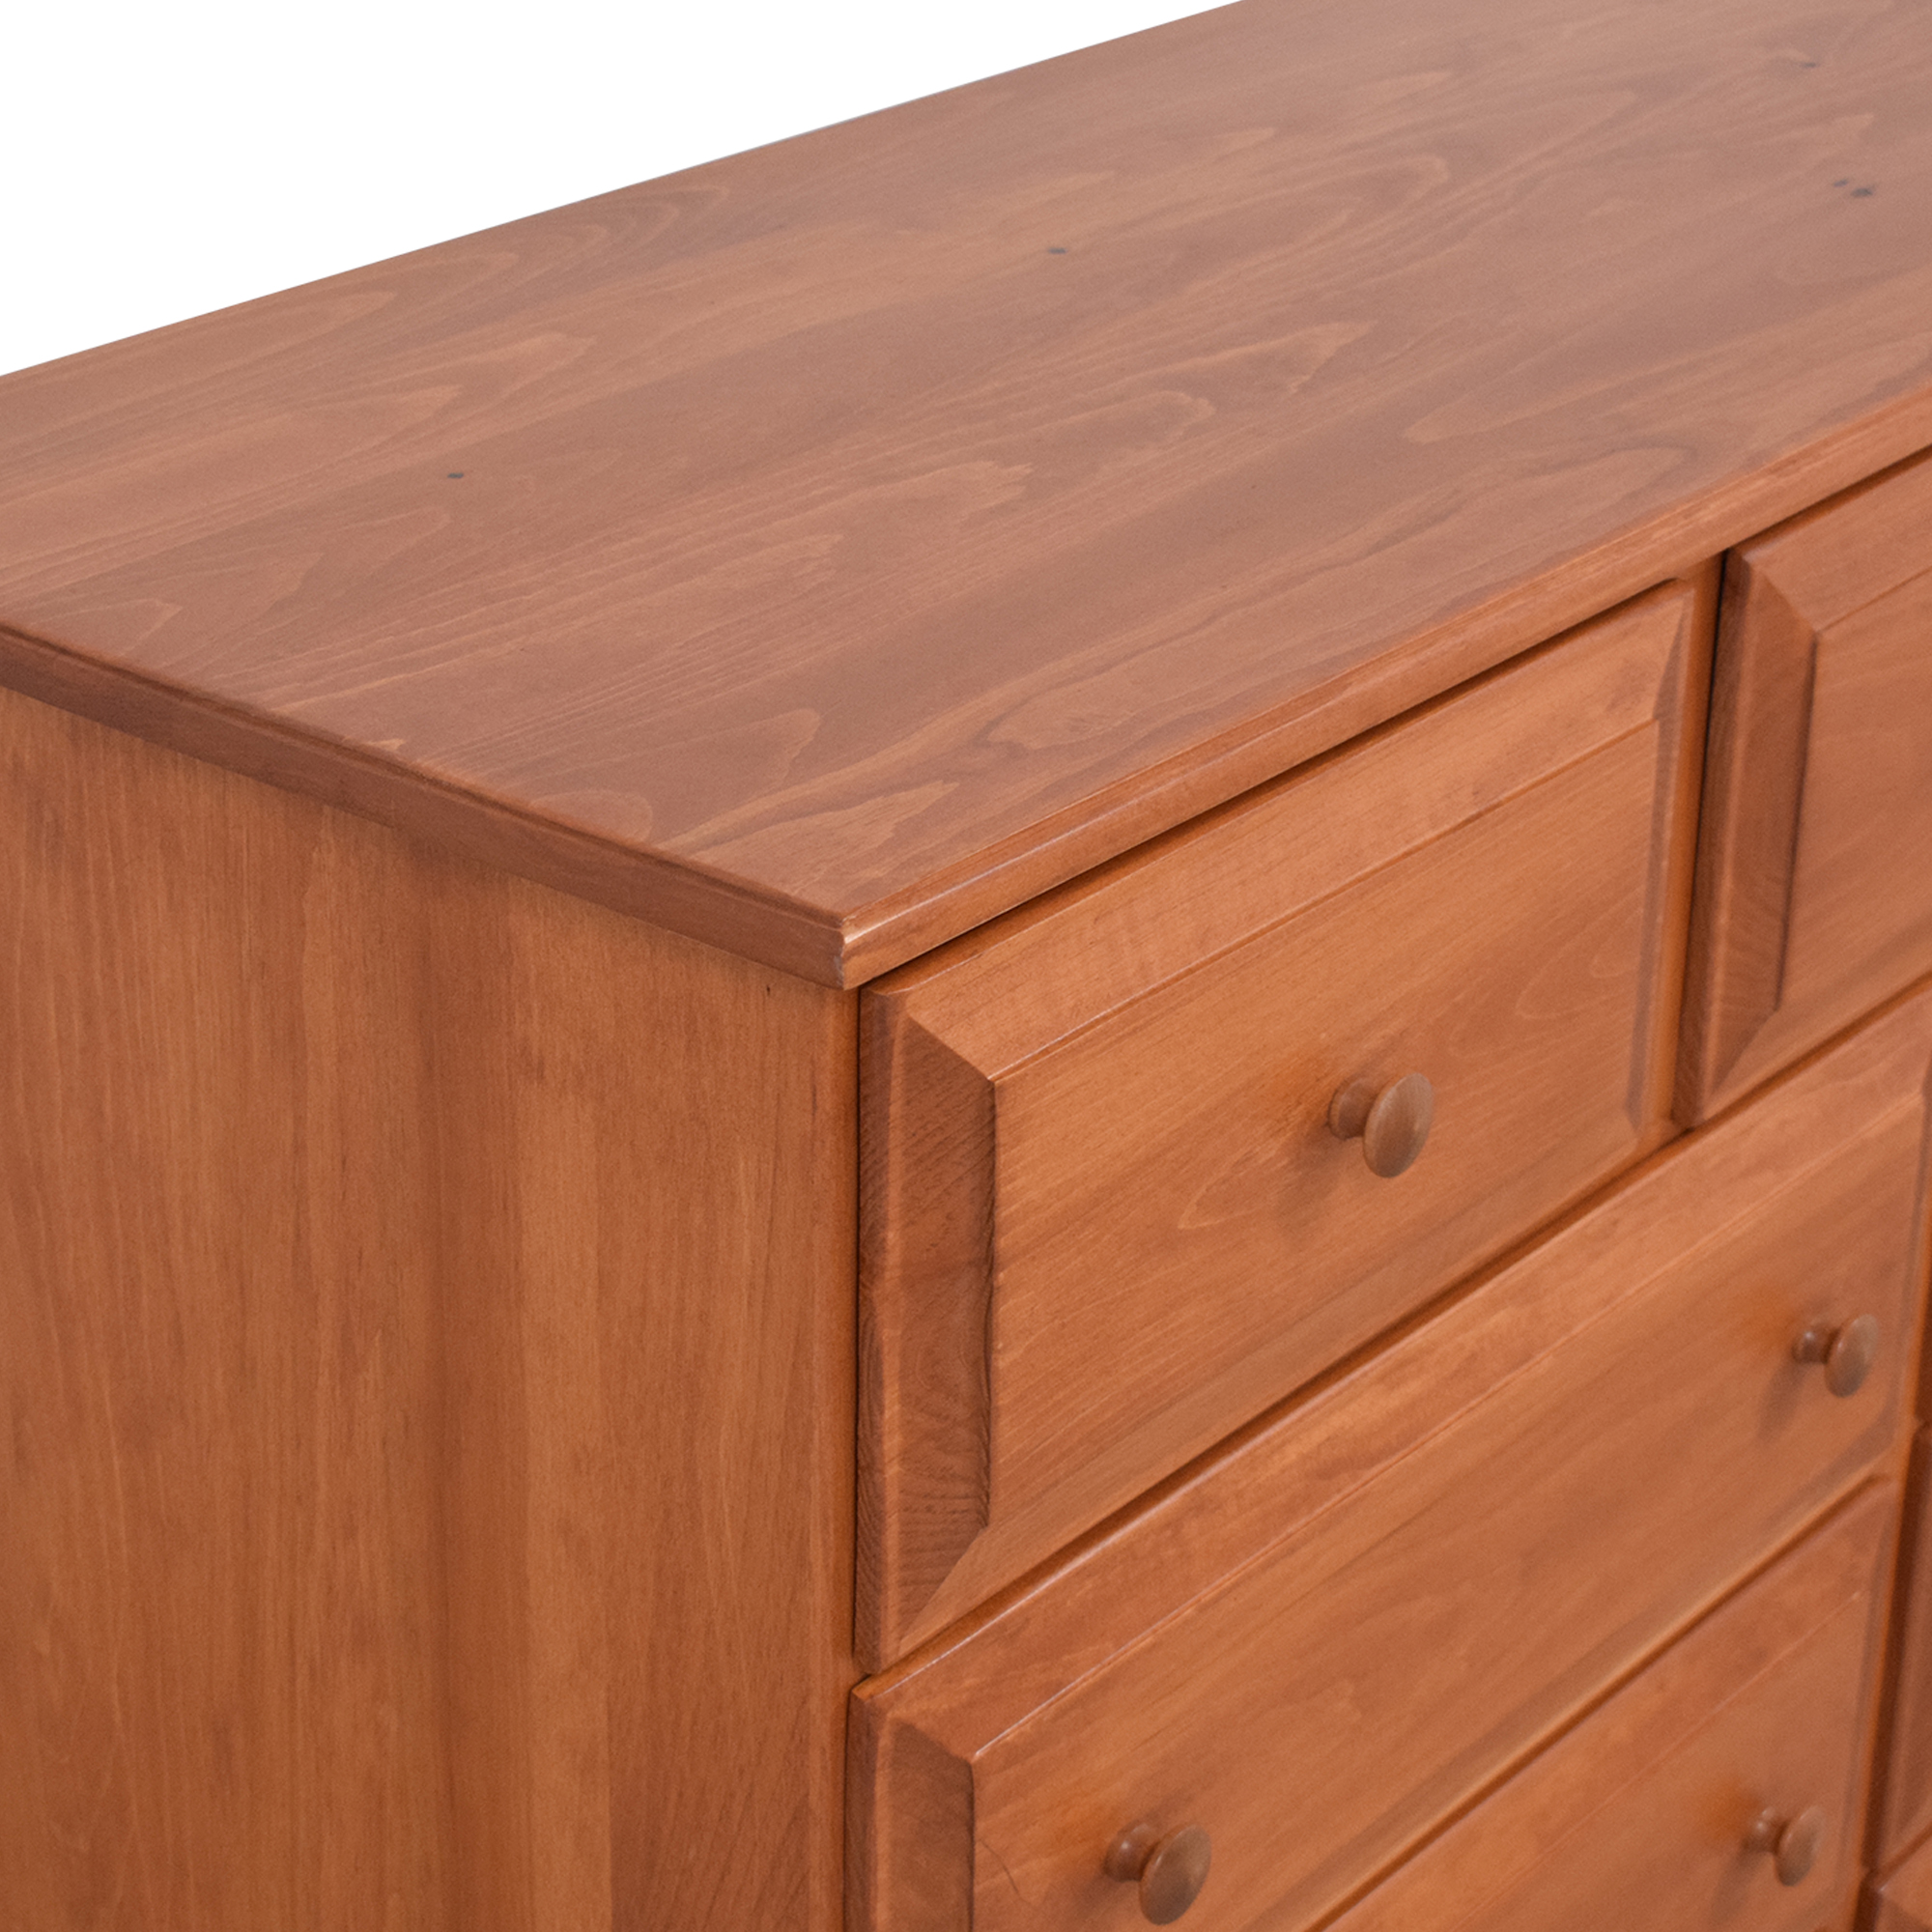 Gothic Cabinet Craft Gothic Cabinet Craft Nine-Drawer Dresser dimensions